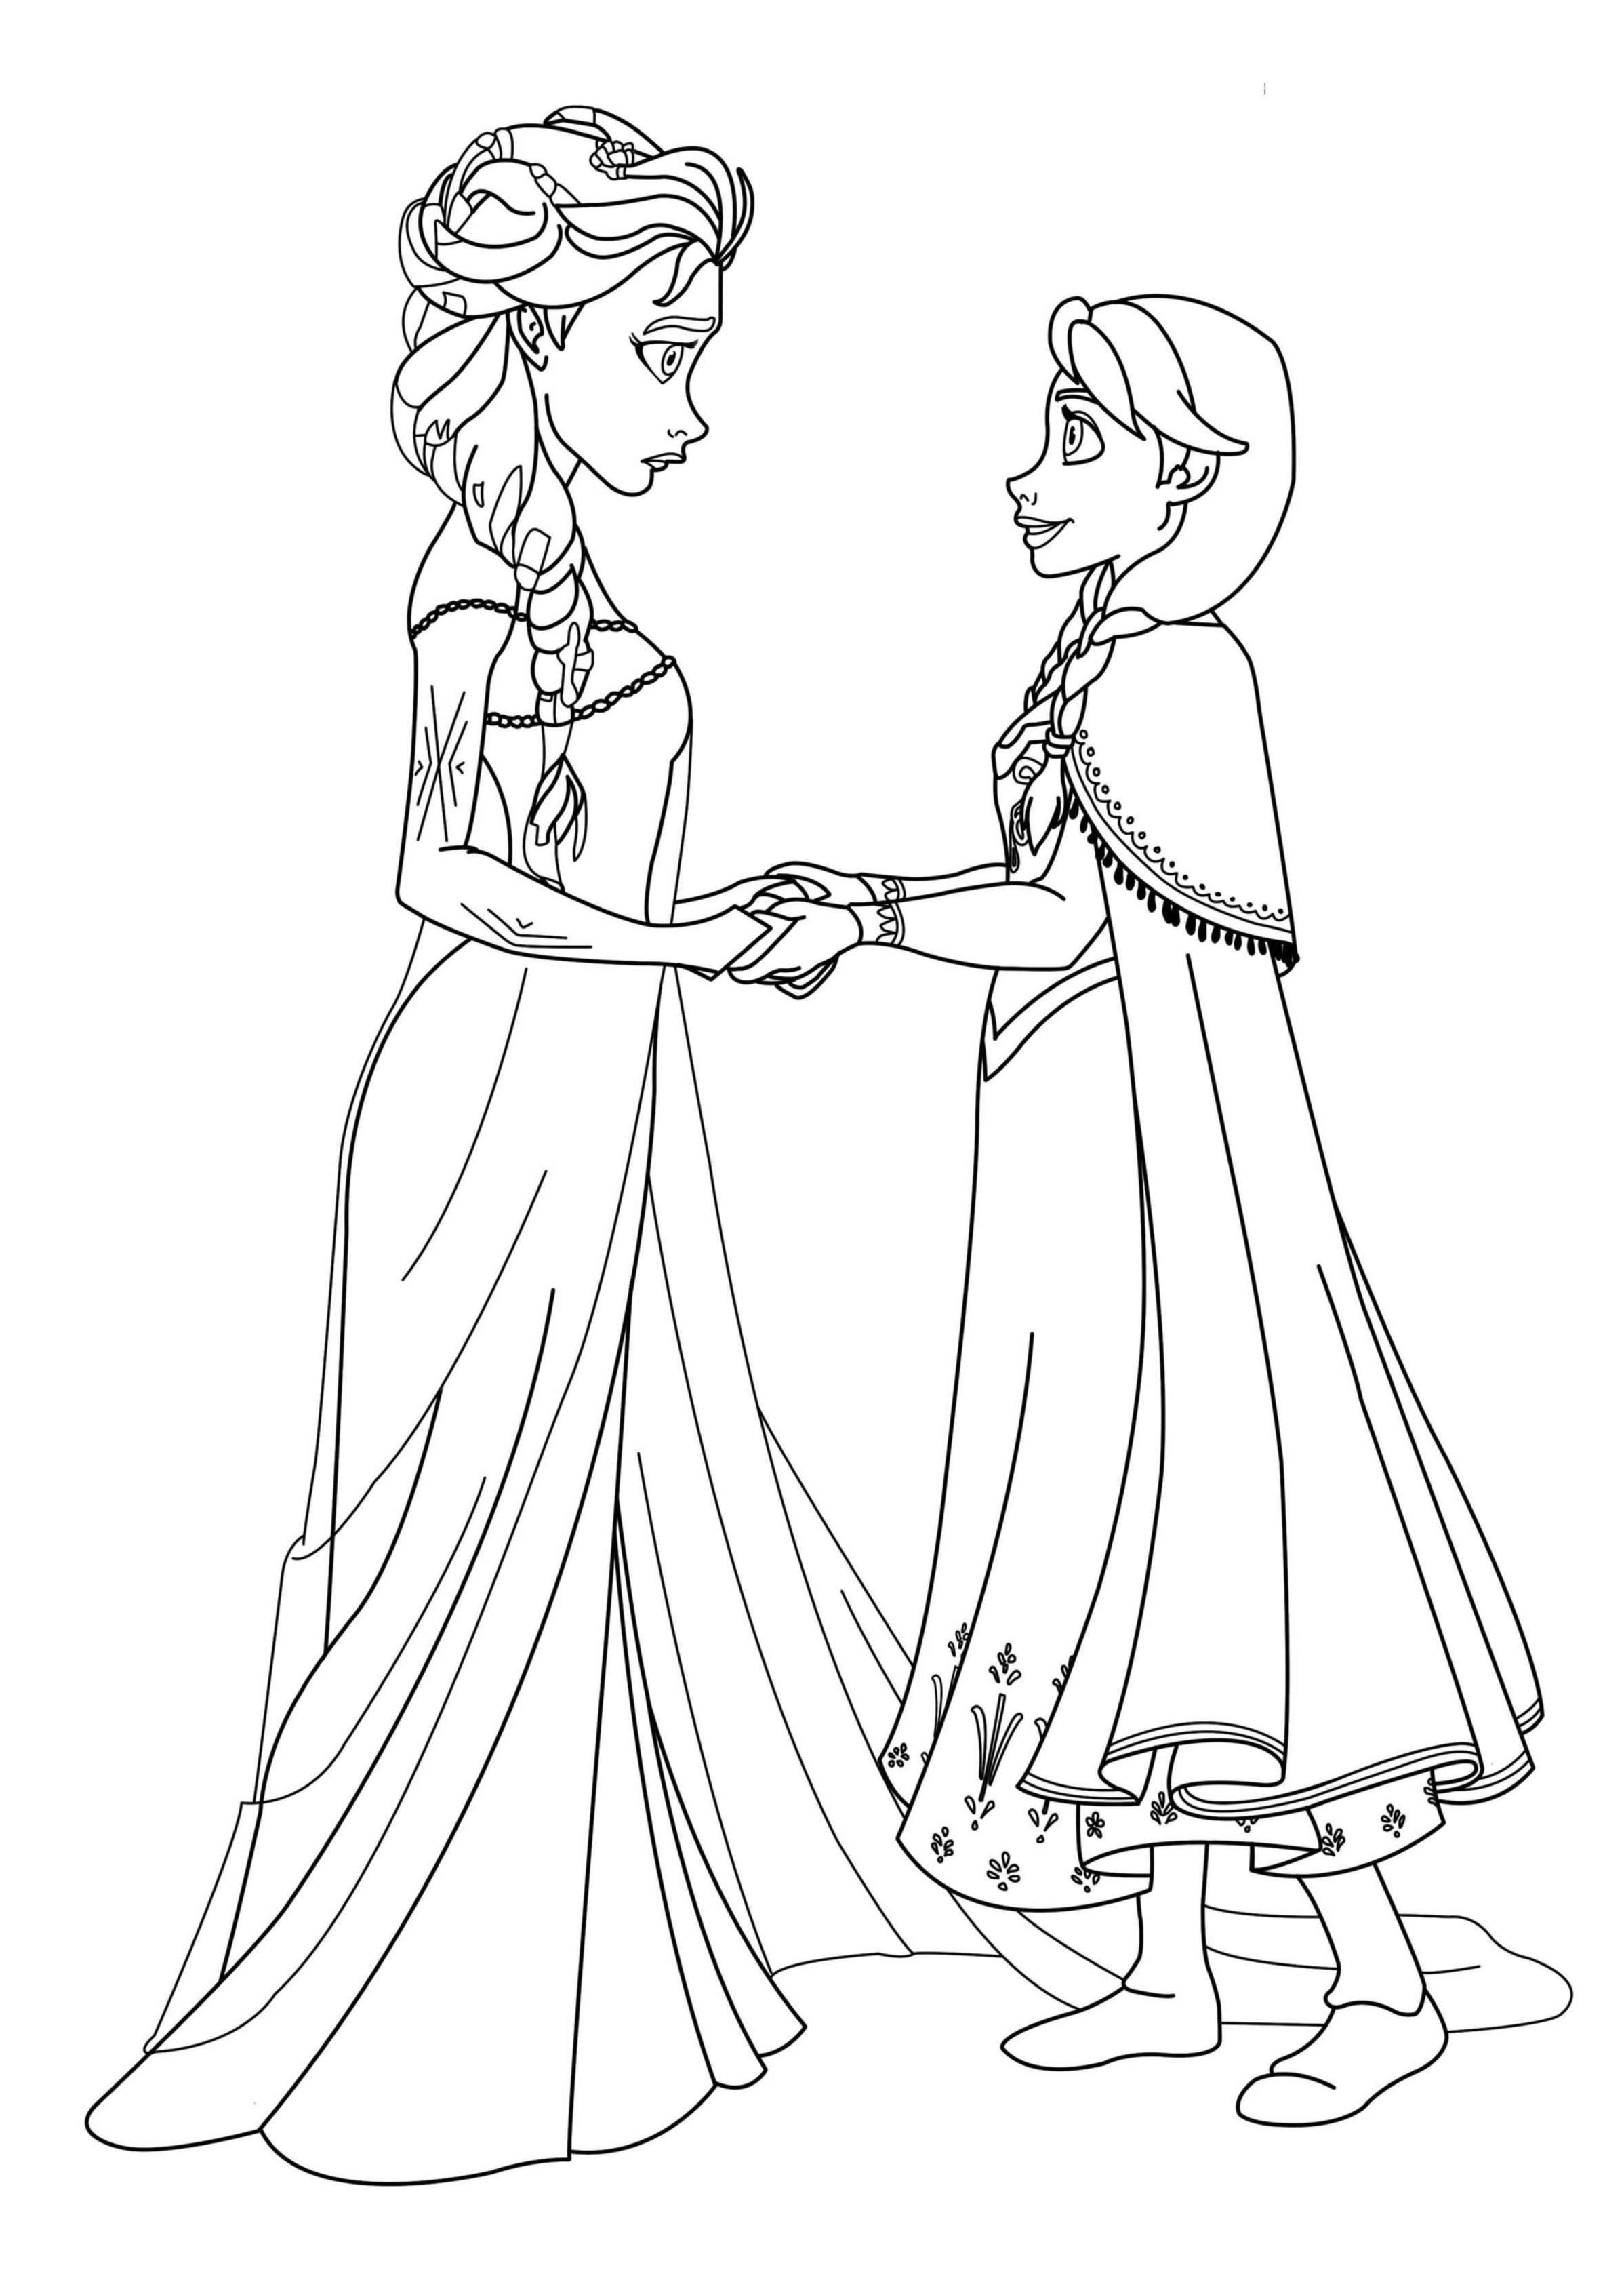 Coloriage Elsa Et Anna Disney A Imprimer